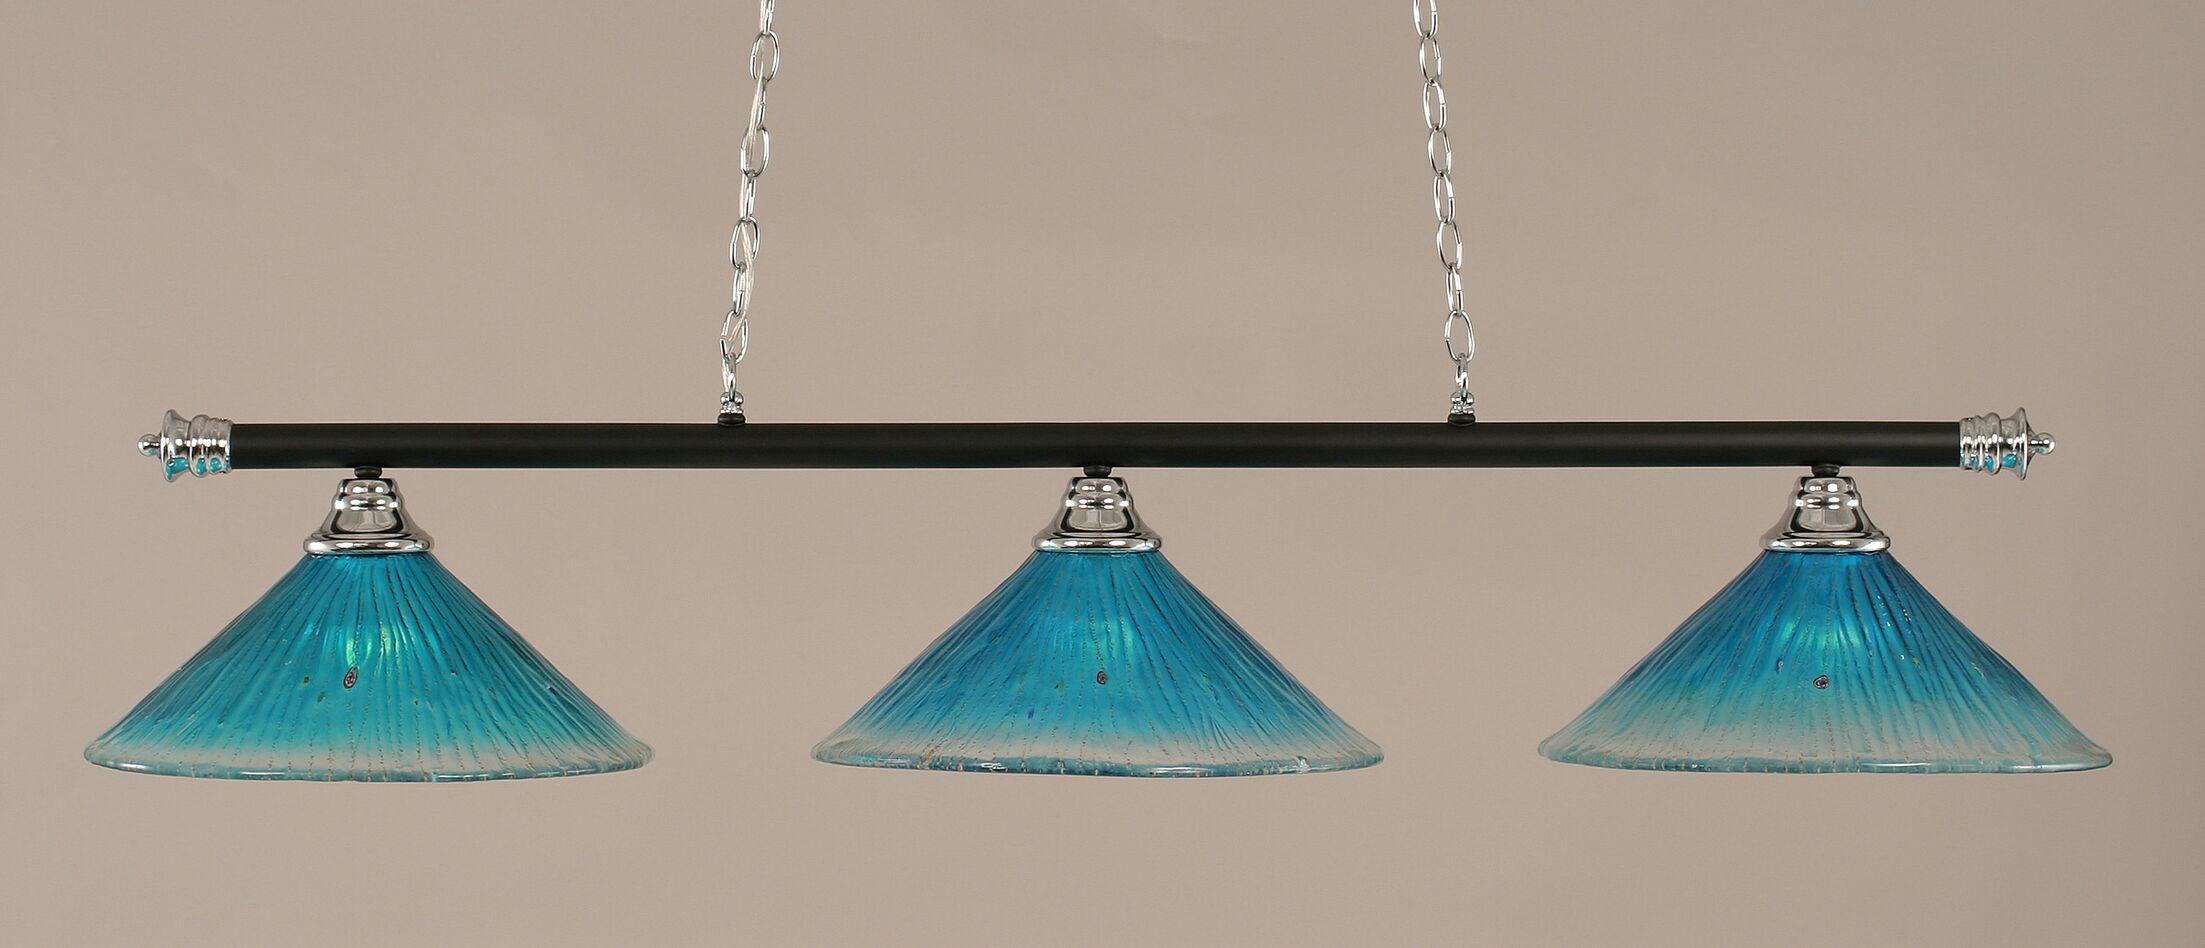 Mendez 3-Light Billiard Light Shade Color: Teal, Finish: Chrome and Matte Black